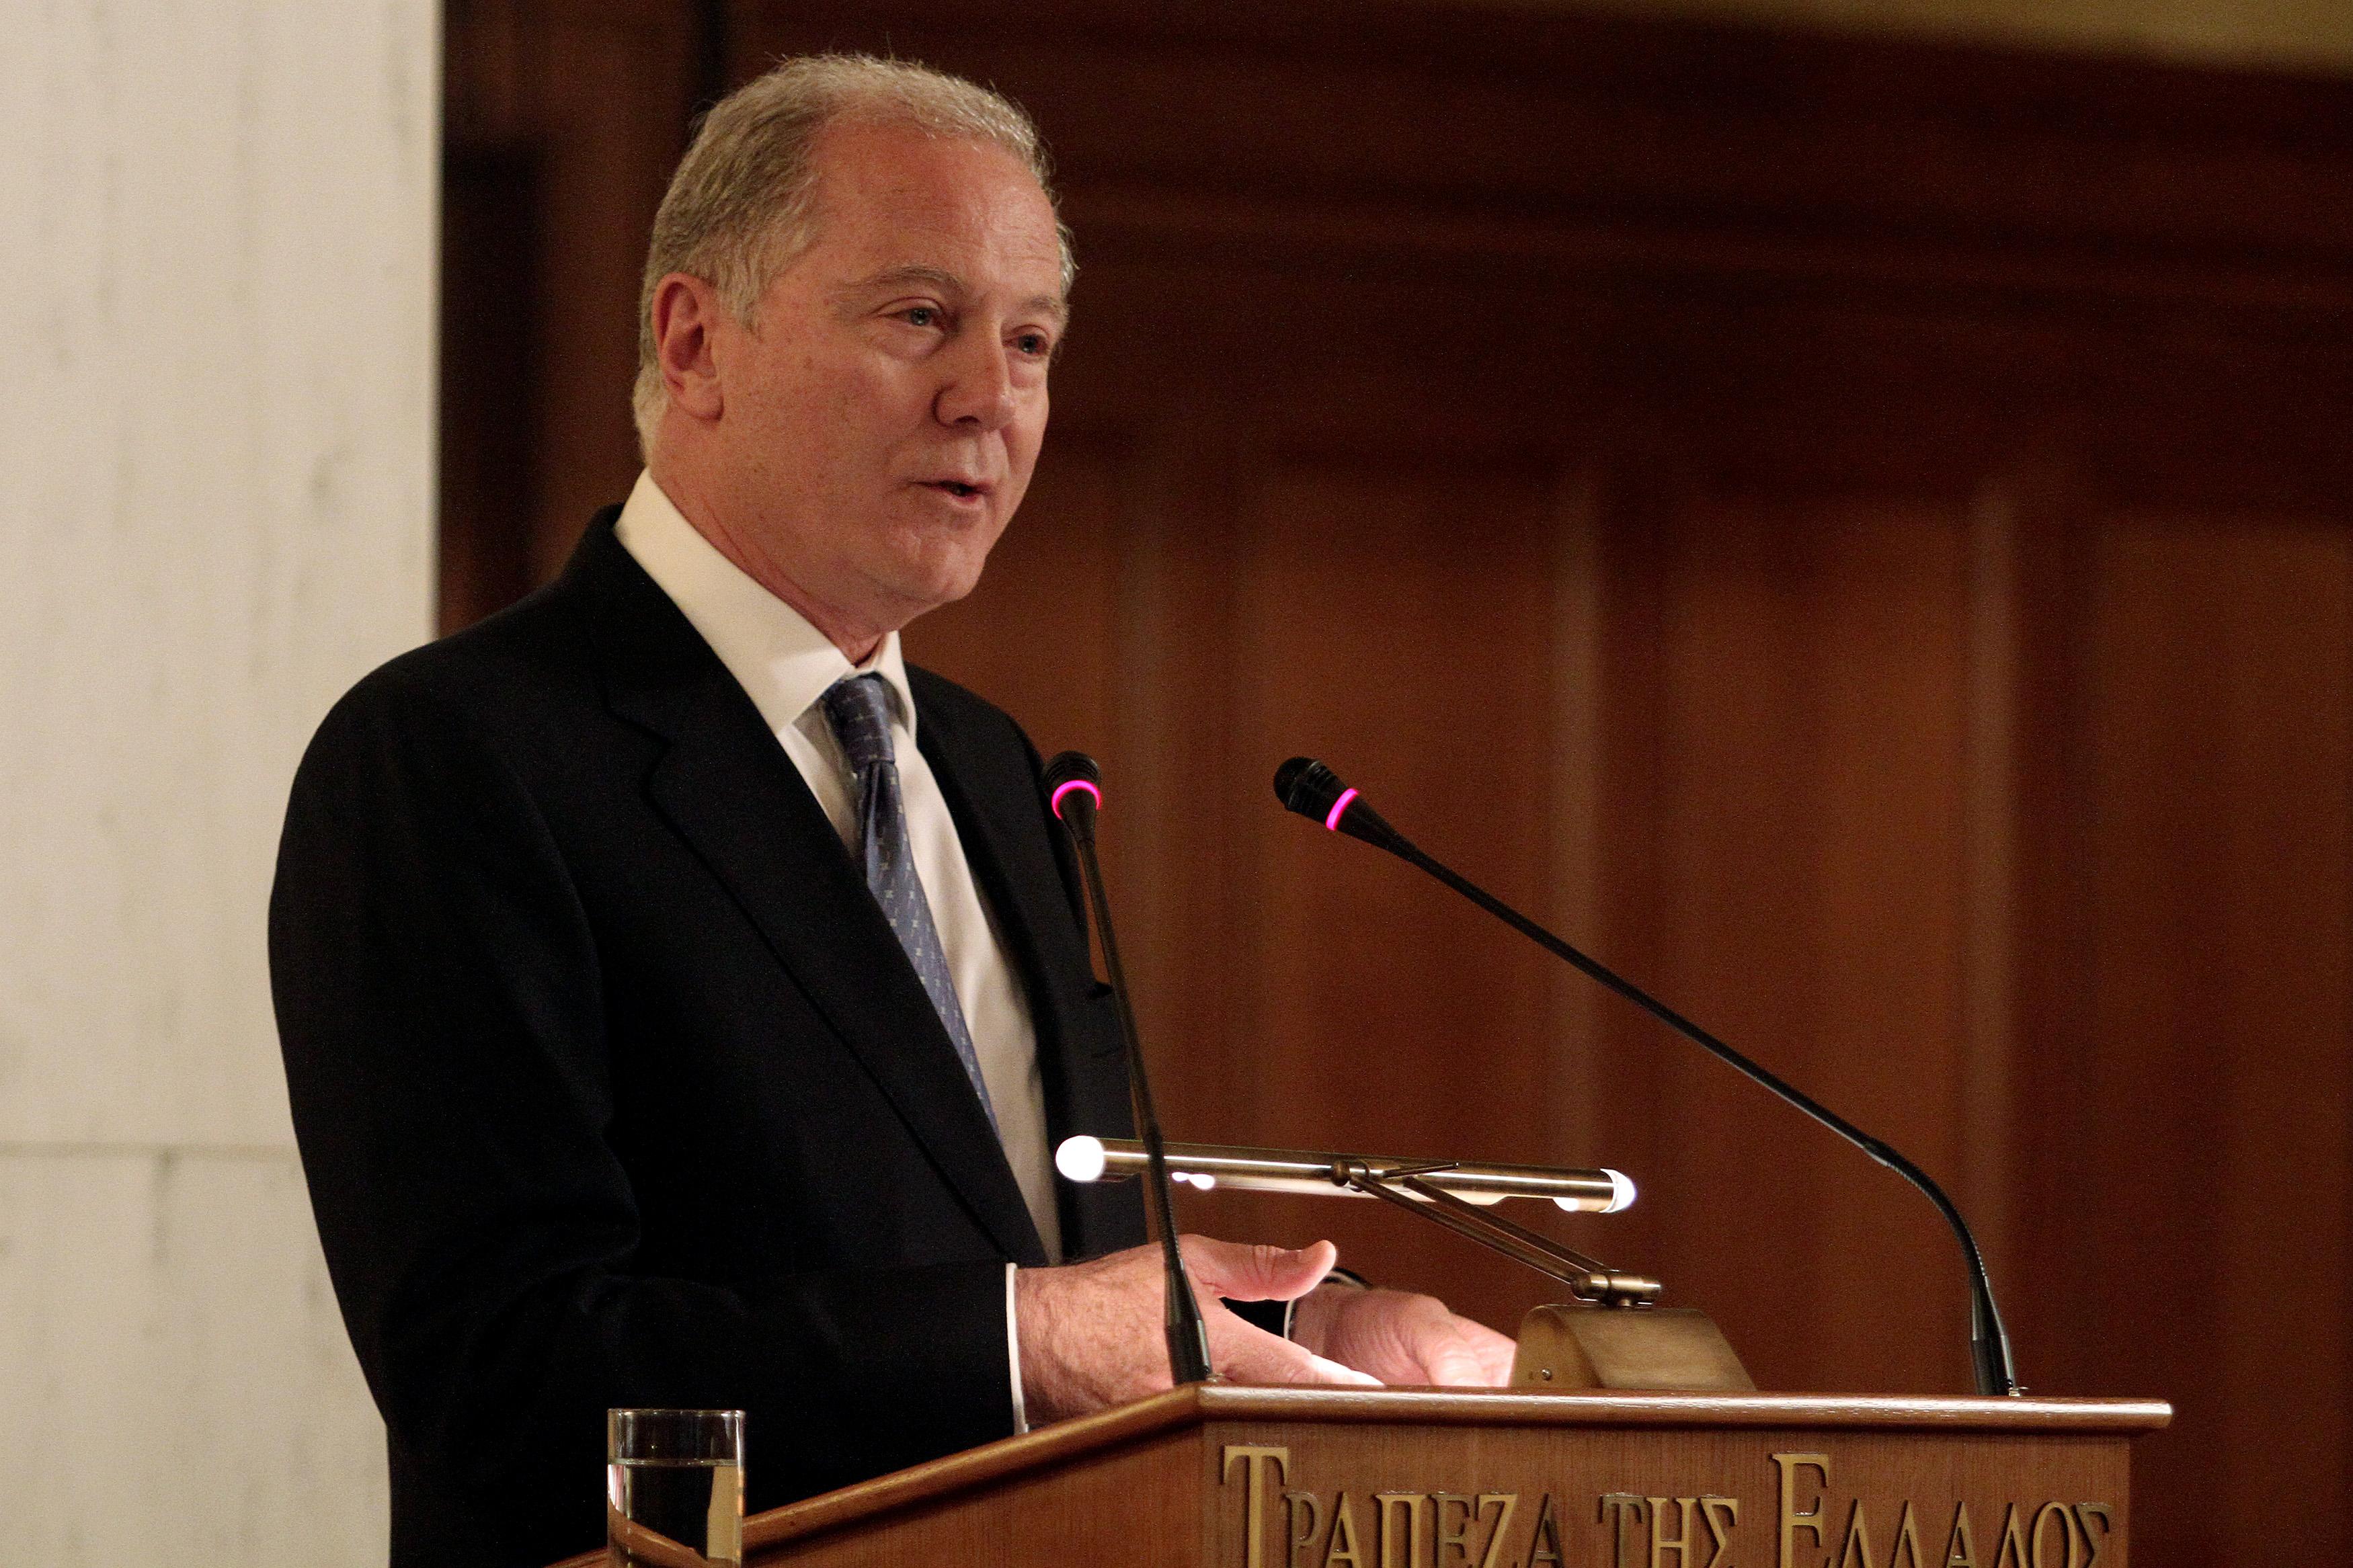 FT: Ο ρόλος Προβόπουλου στην παραμονή της Ελλάδας στο ευρώ | tovima.gr